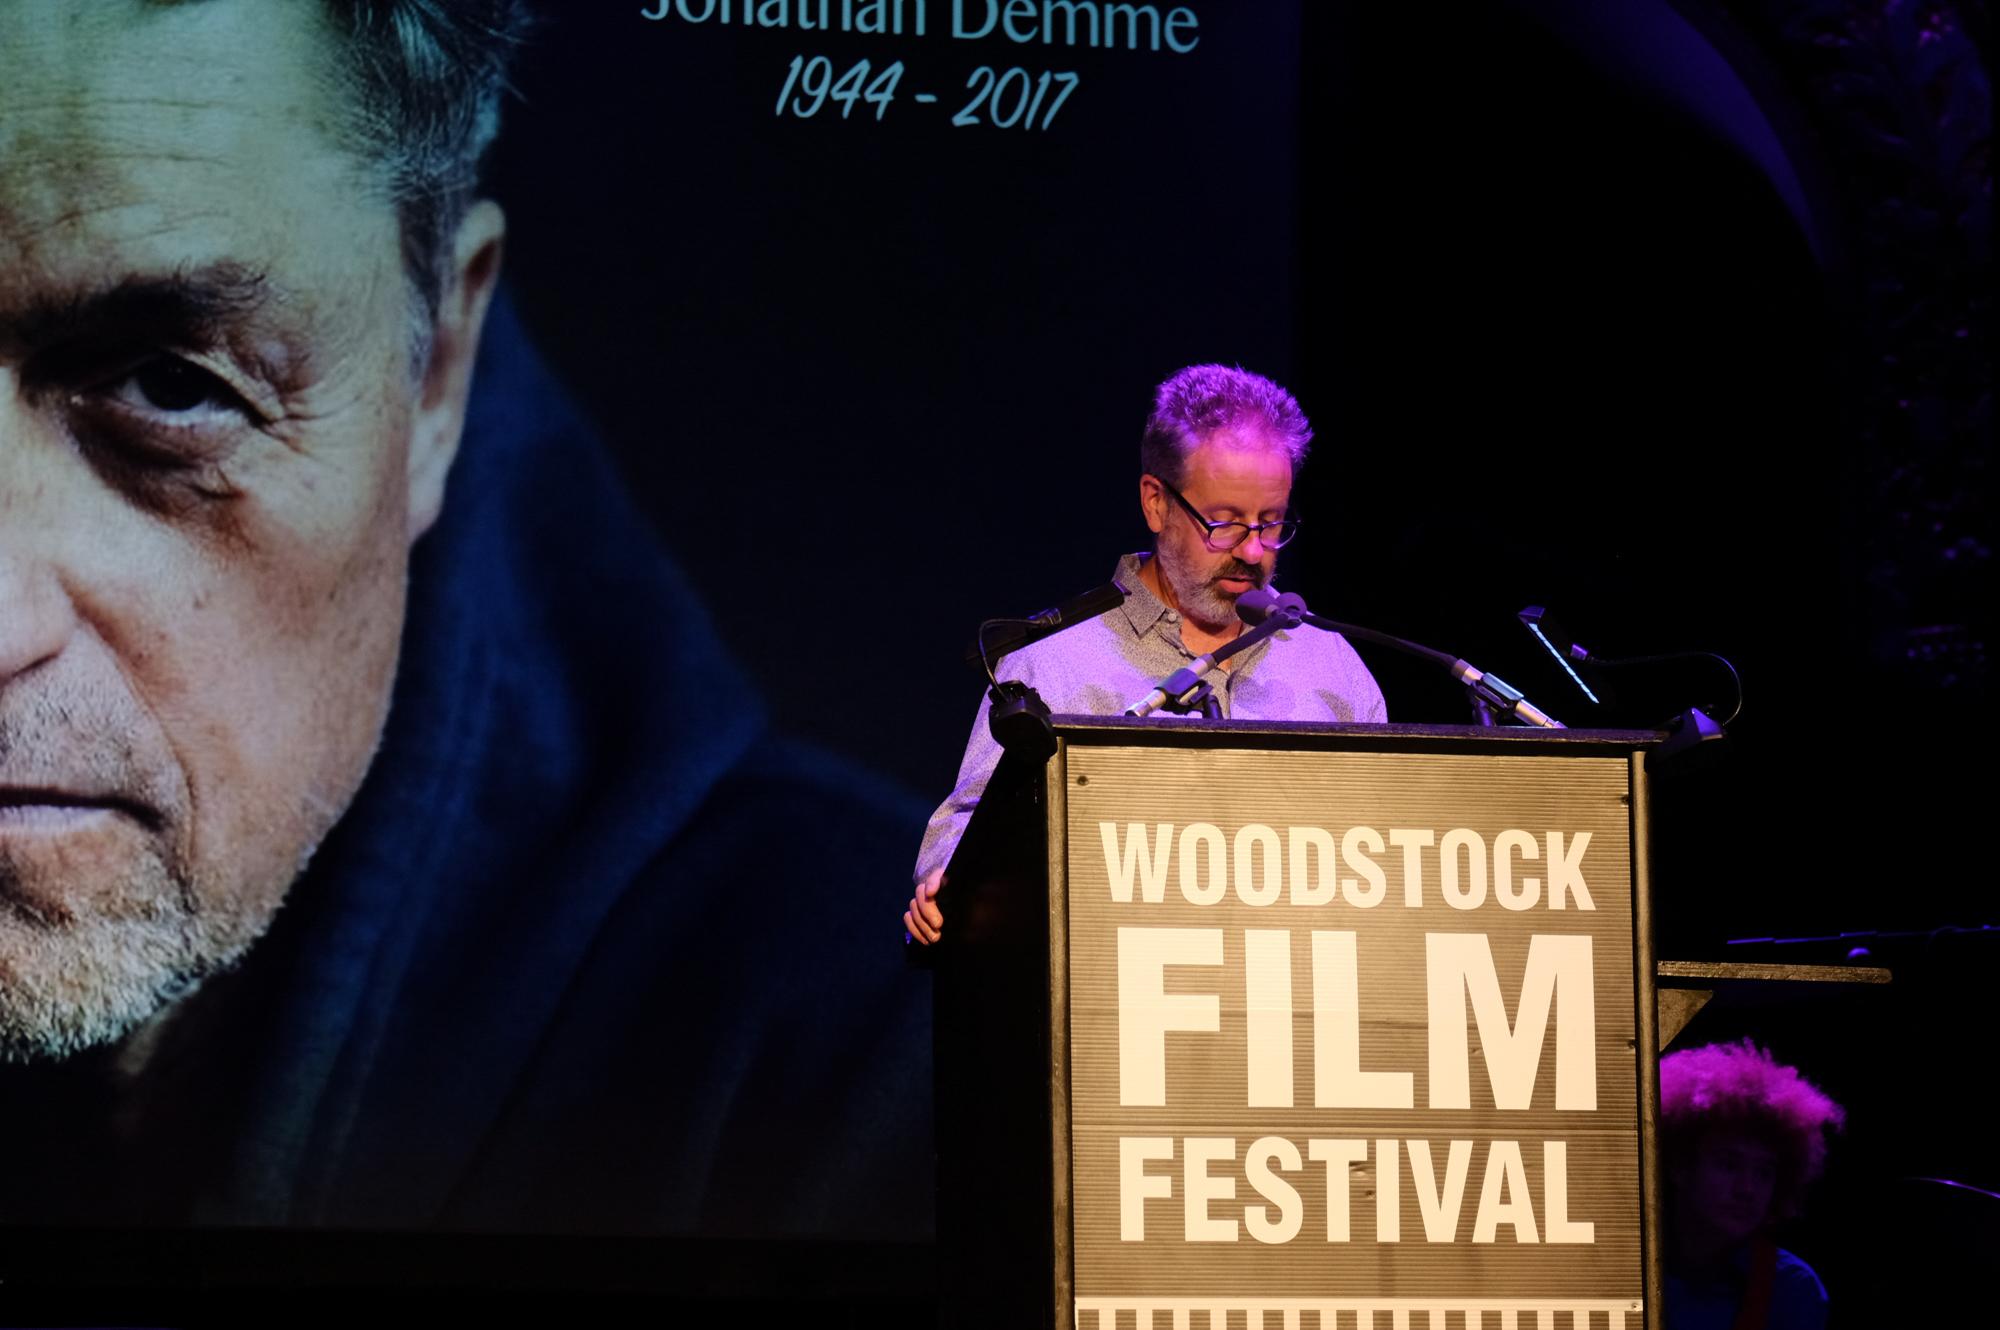 Peter Saraf at the 2017 Maverick Awards at the 2017 Woodstock Film Festival